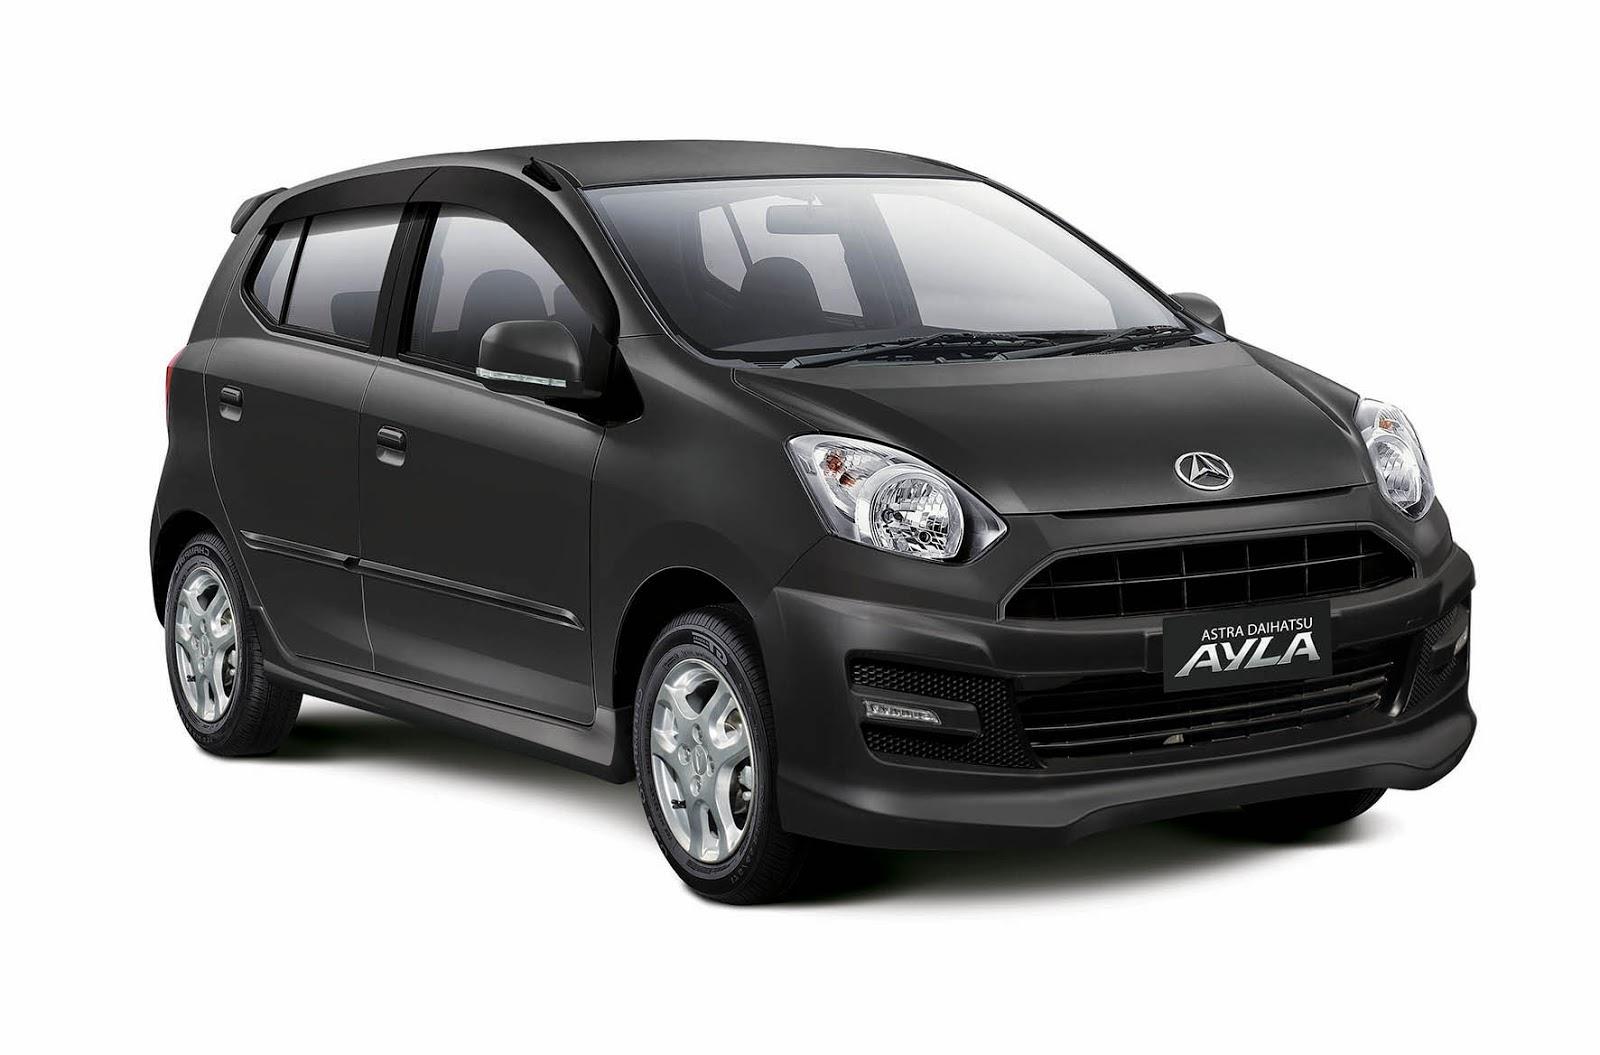 Spesifikasi dan Harga Daihatsu Ayla SPK Daihatsu